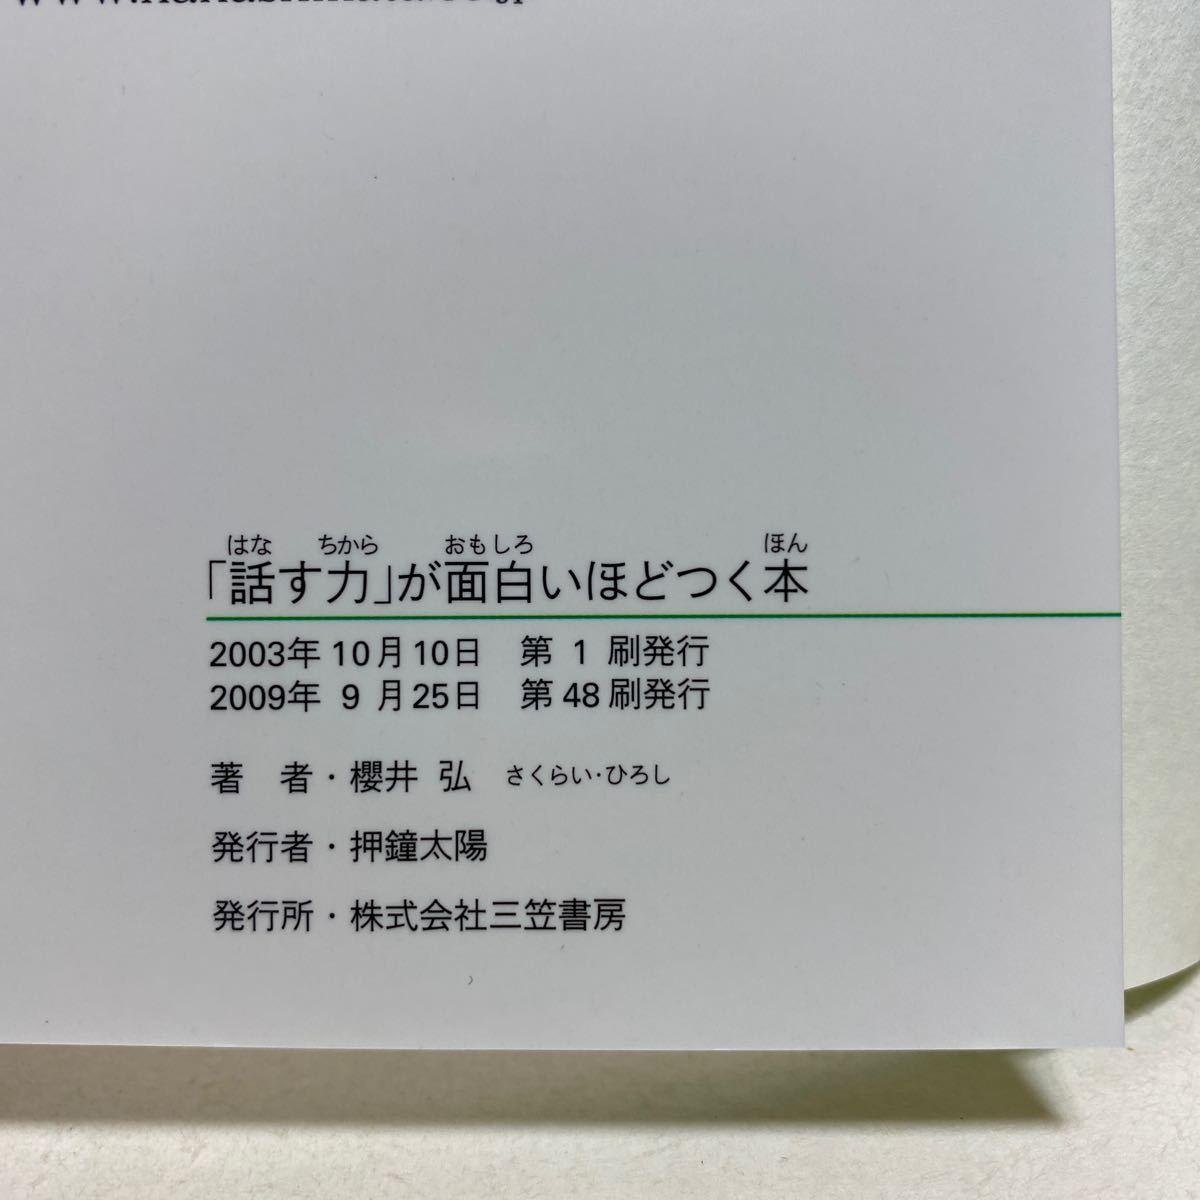 ☆a8/「話す力」が面白いほどつく本 櫻井弘 知的生きかた文庫 4冊まで送料180円(ゆうメール)_画像6